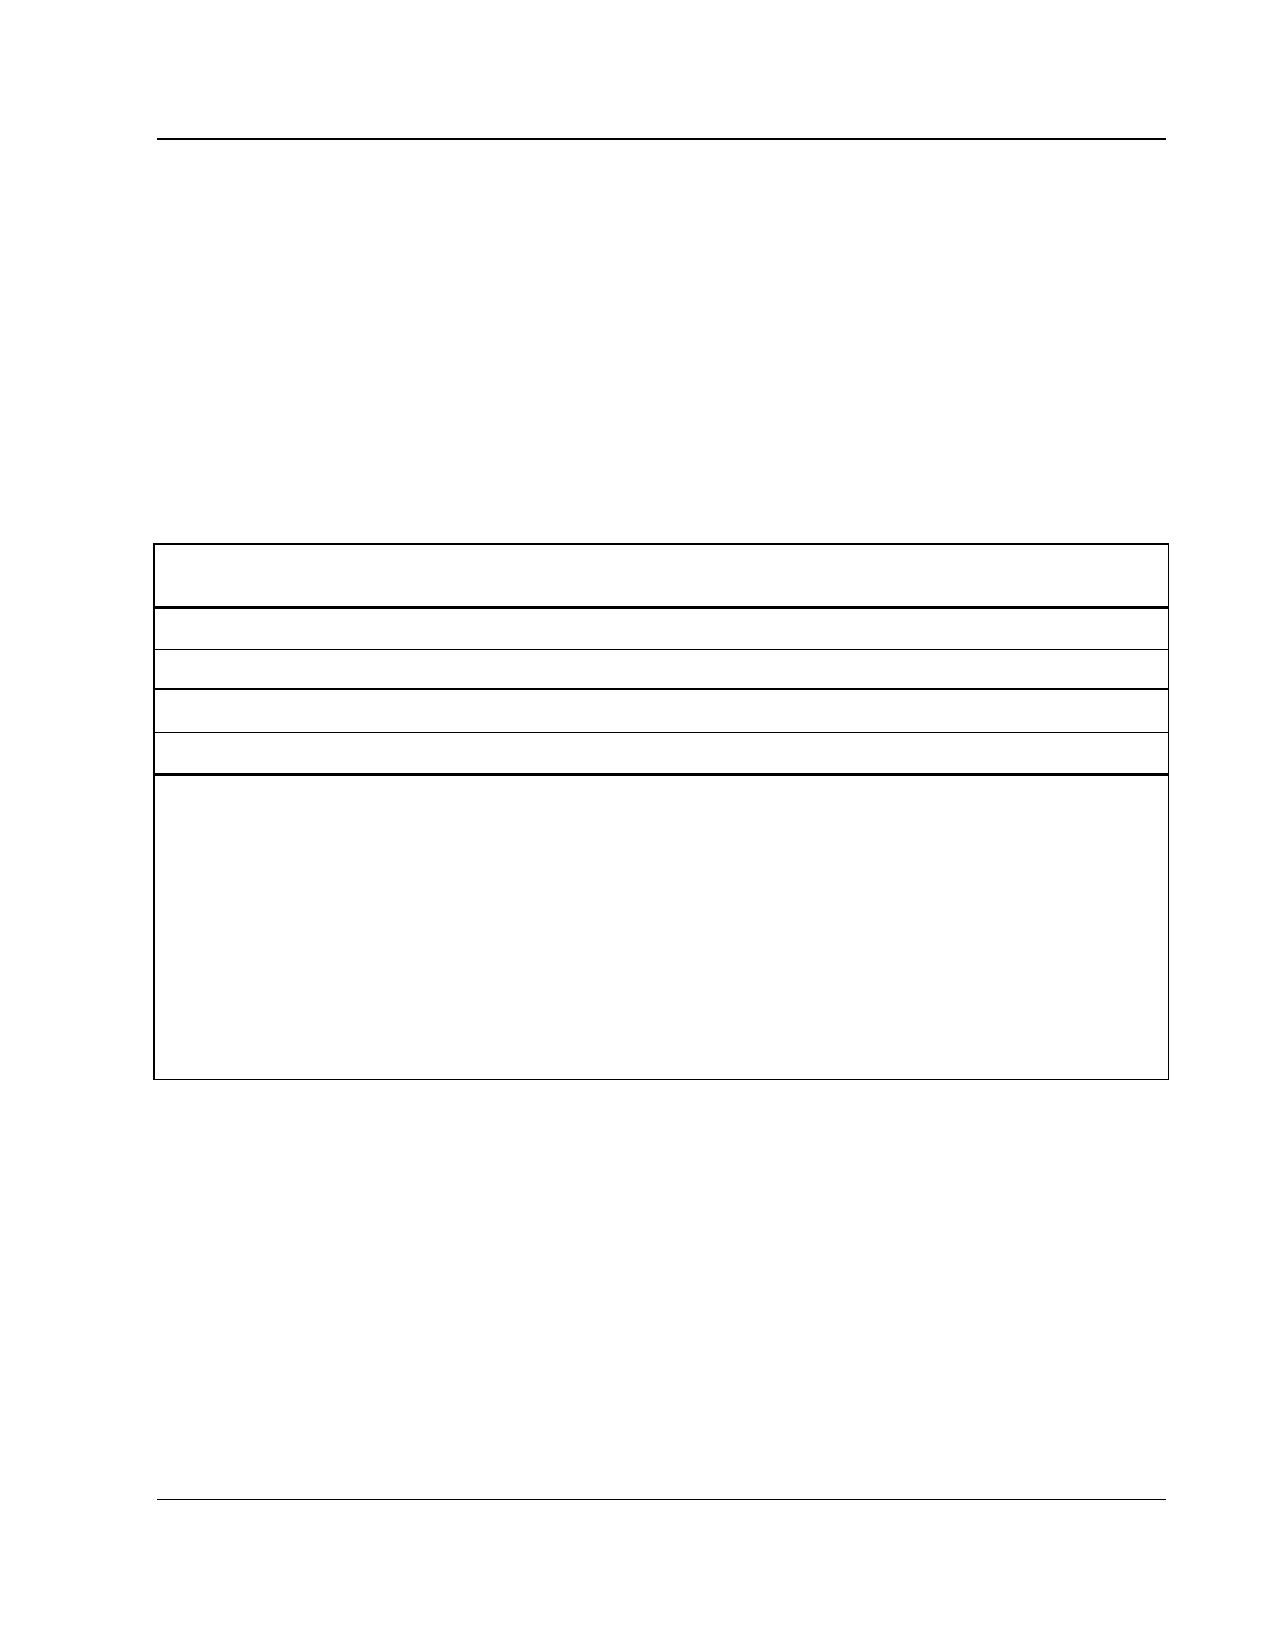 1N950 Datenblatt PDF